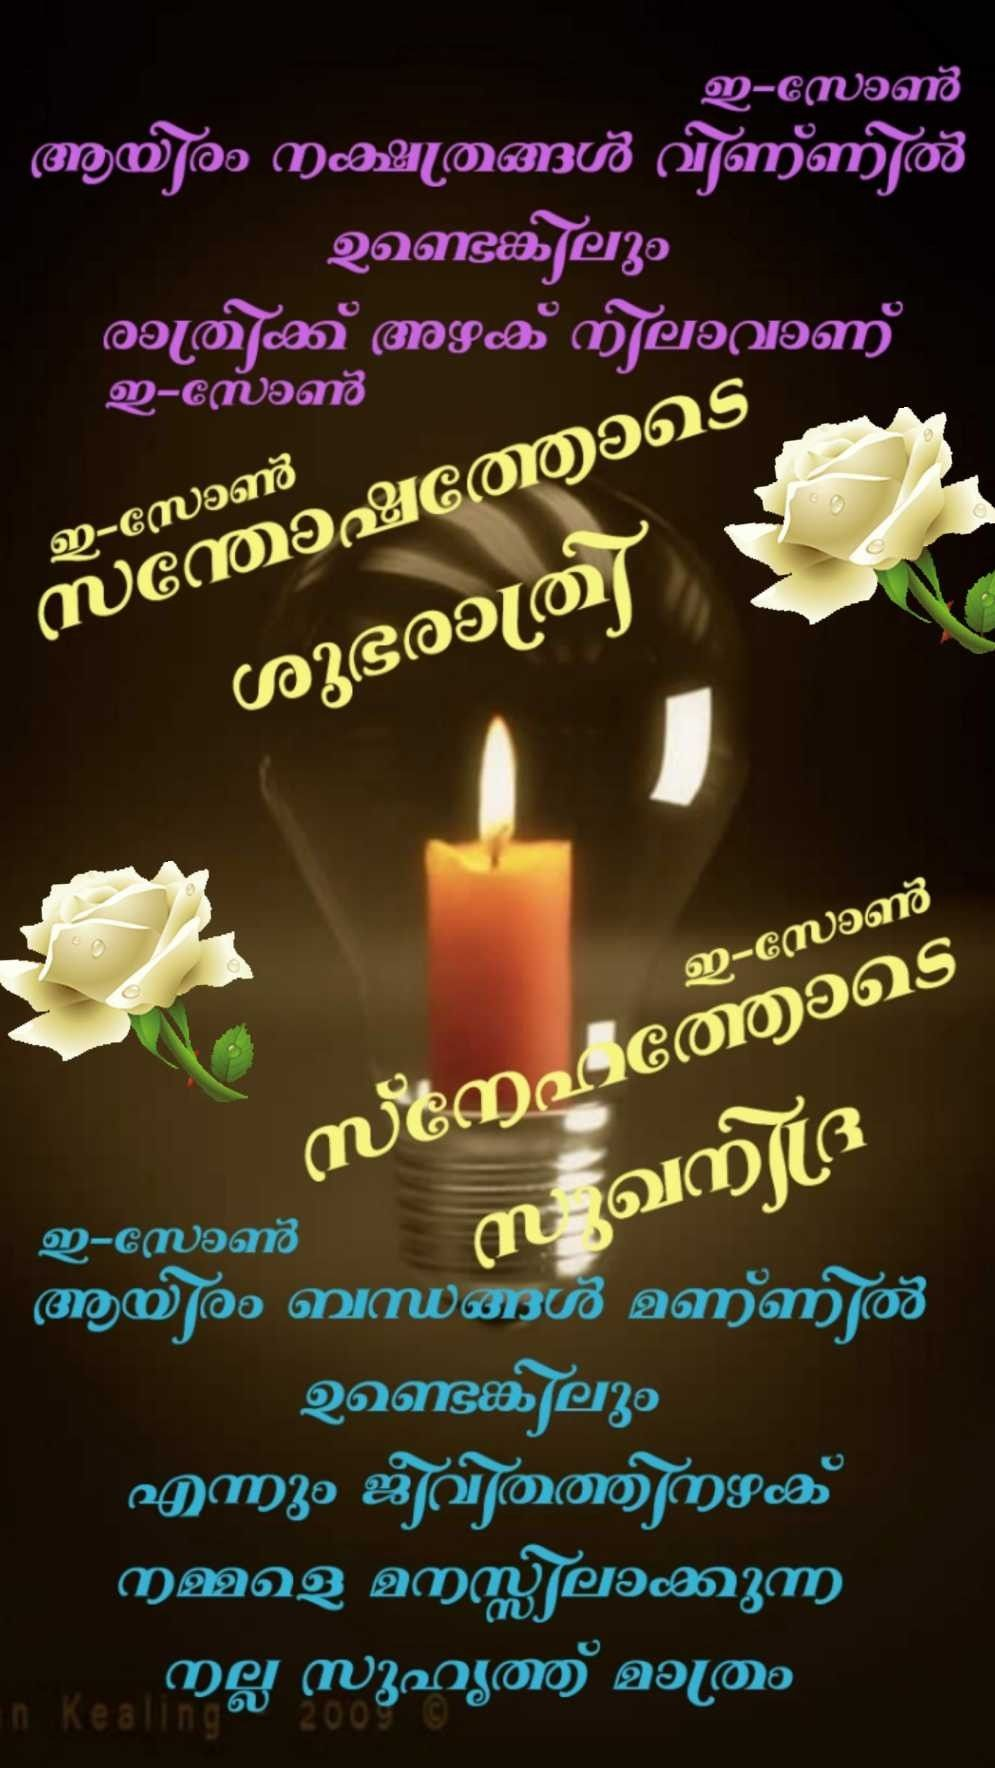 Pin by Eron on Good Night ( malayalam ) | Good night quotes, Good morning greetings, Good night messages